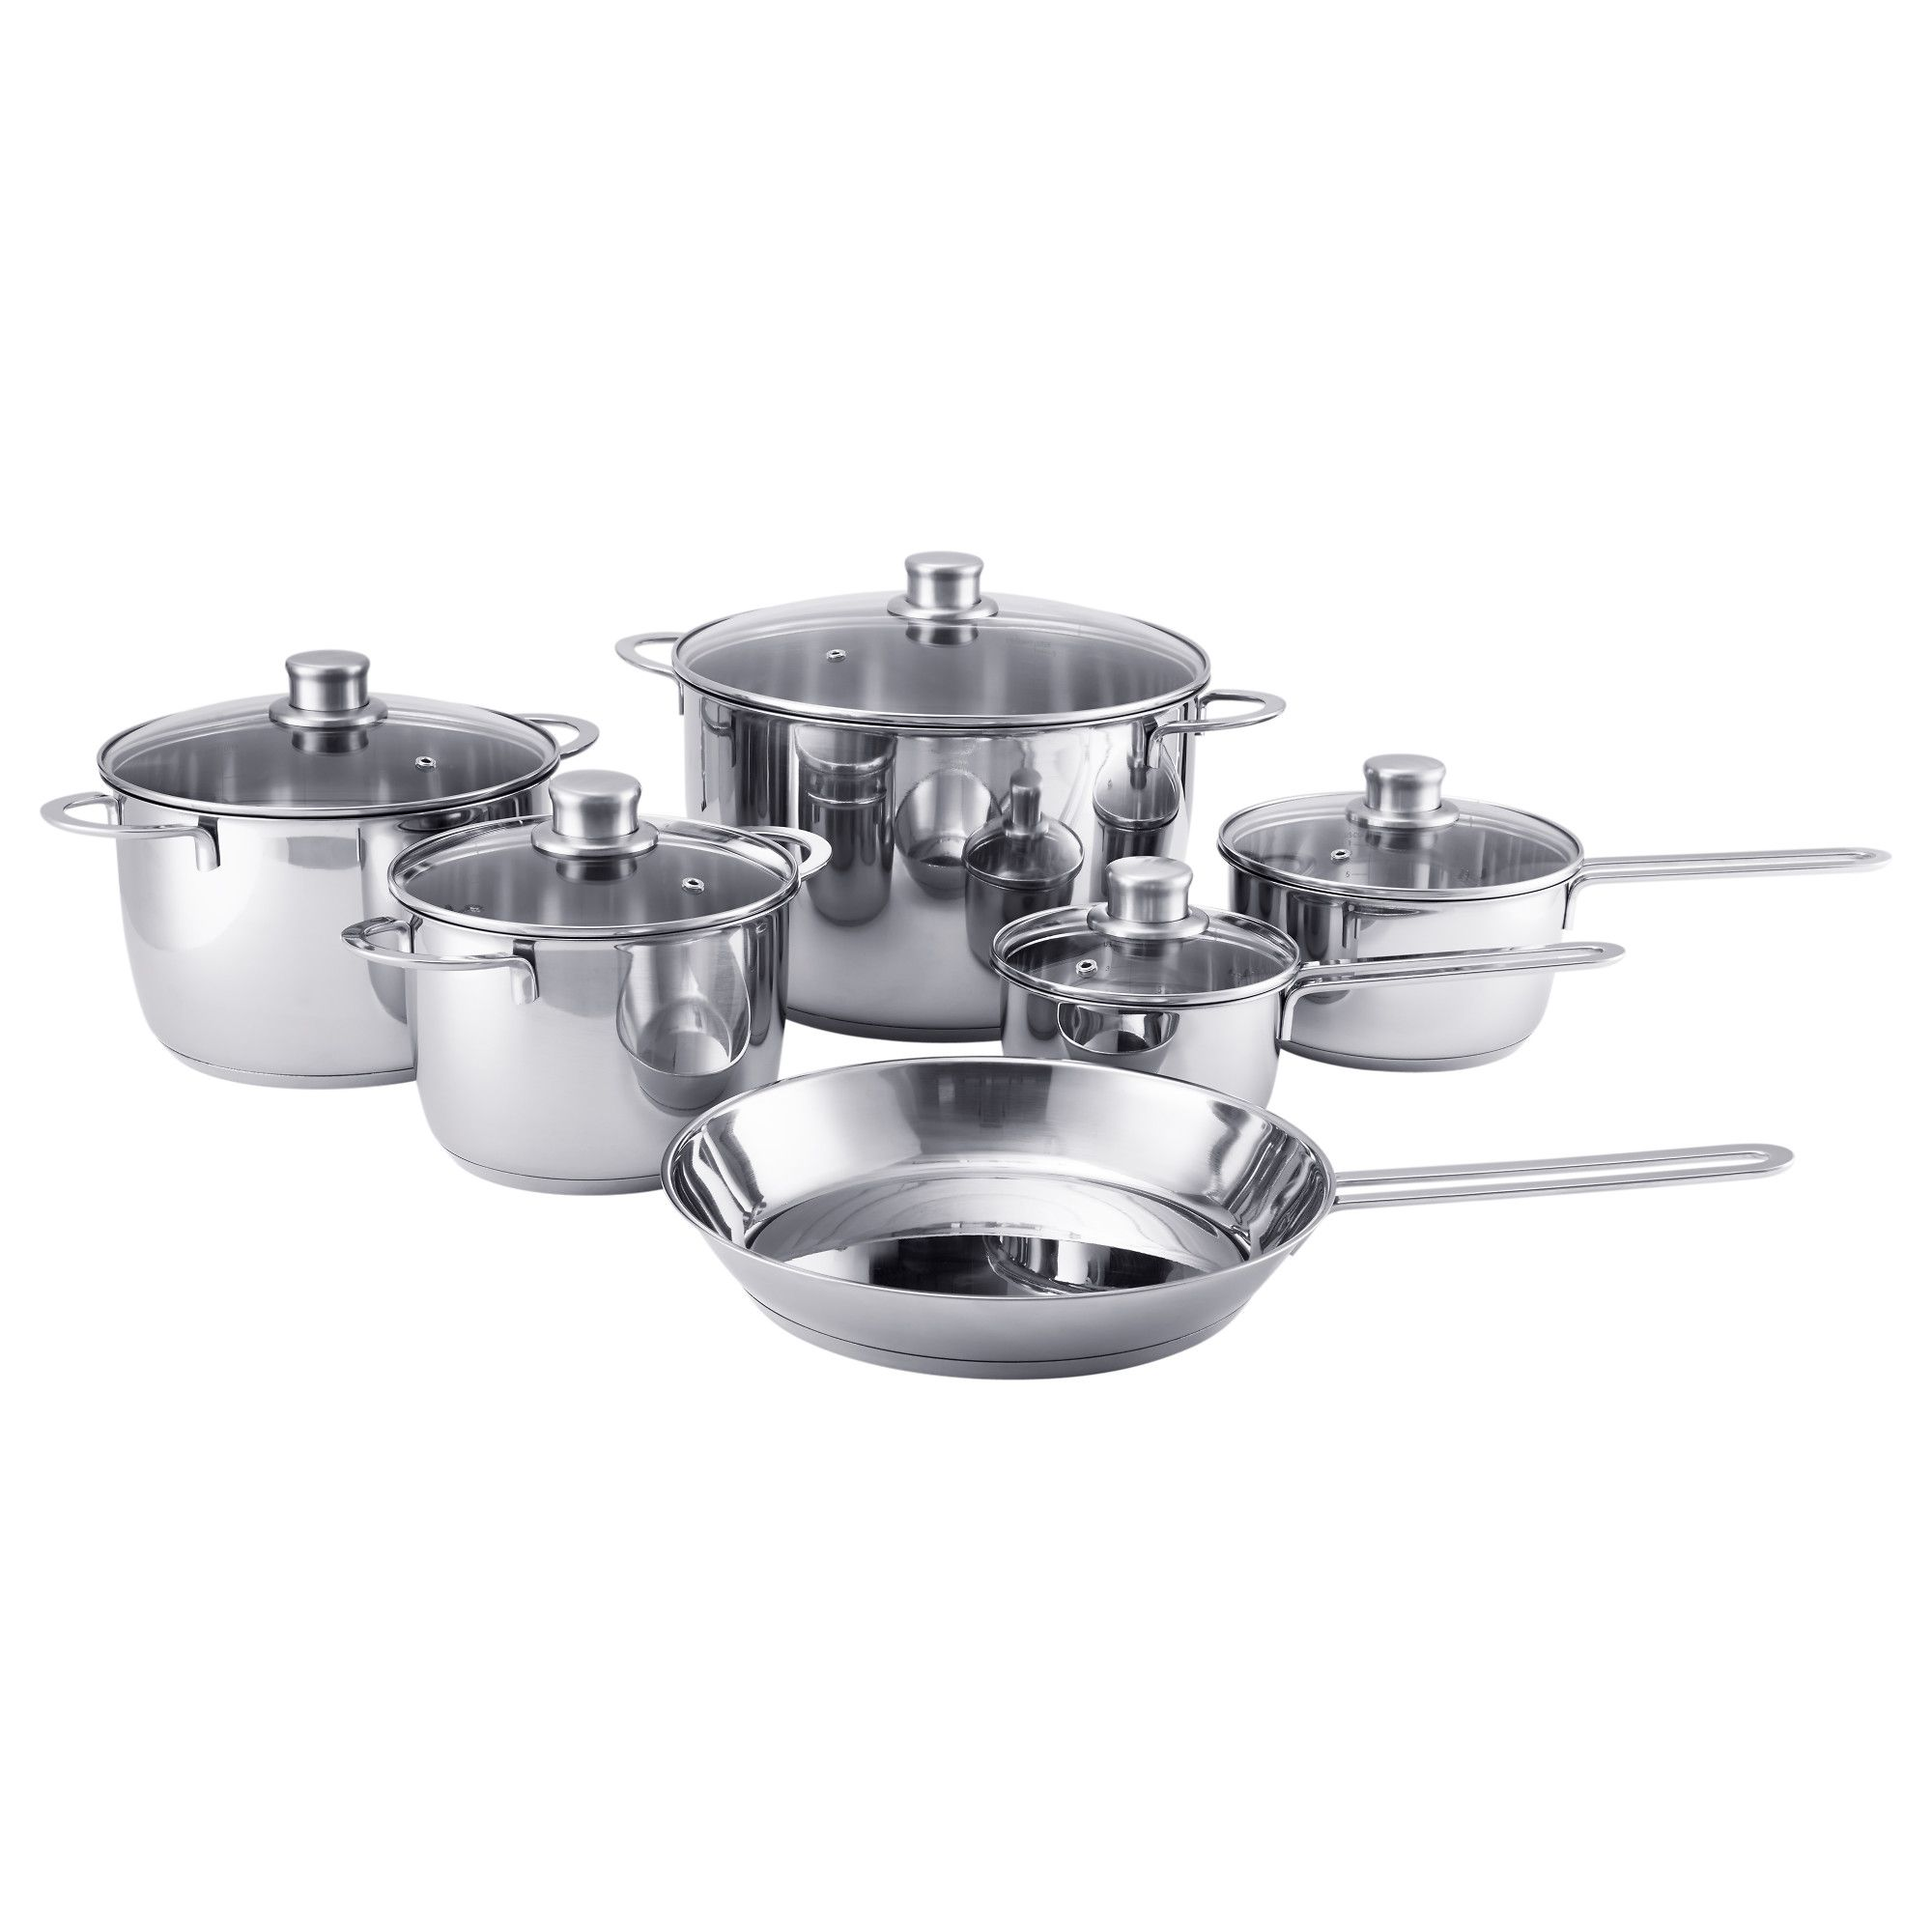 Ikea Polerad Stainless Steel 11 Piece Cookware Set